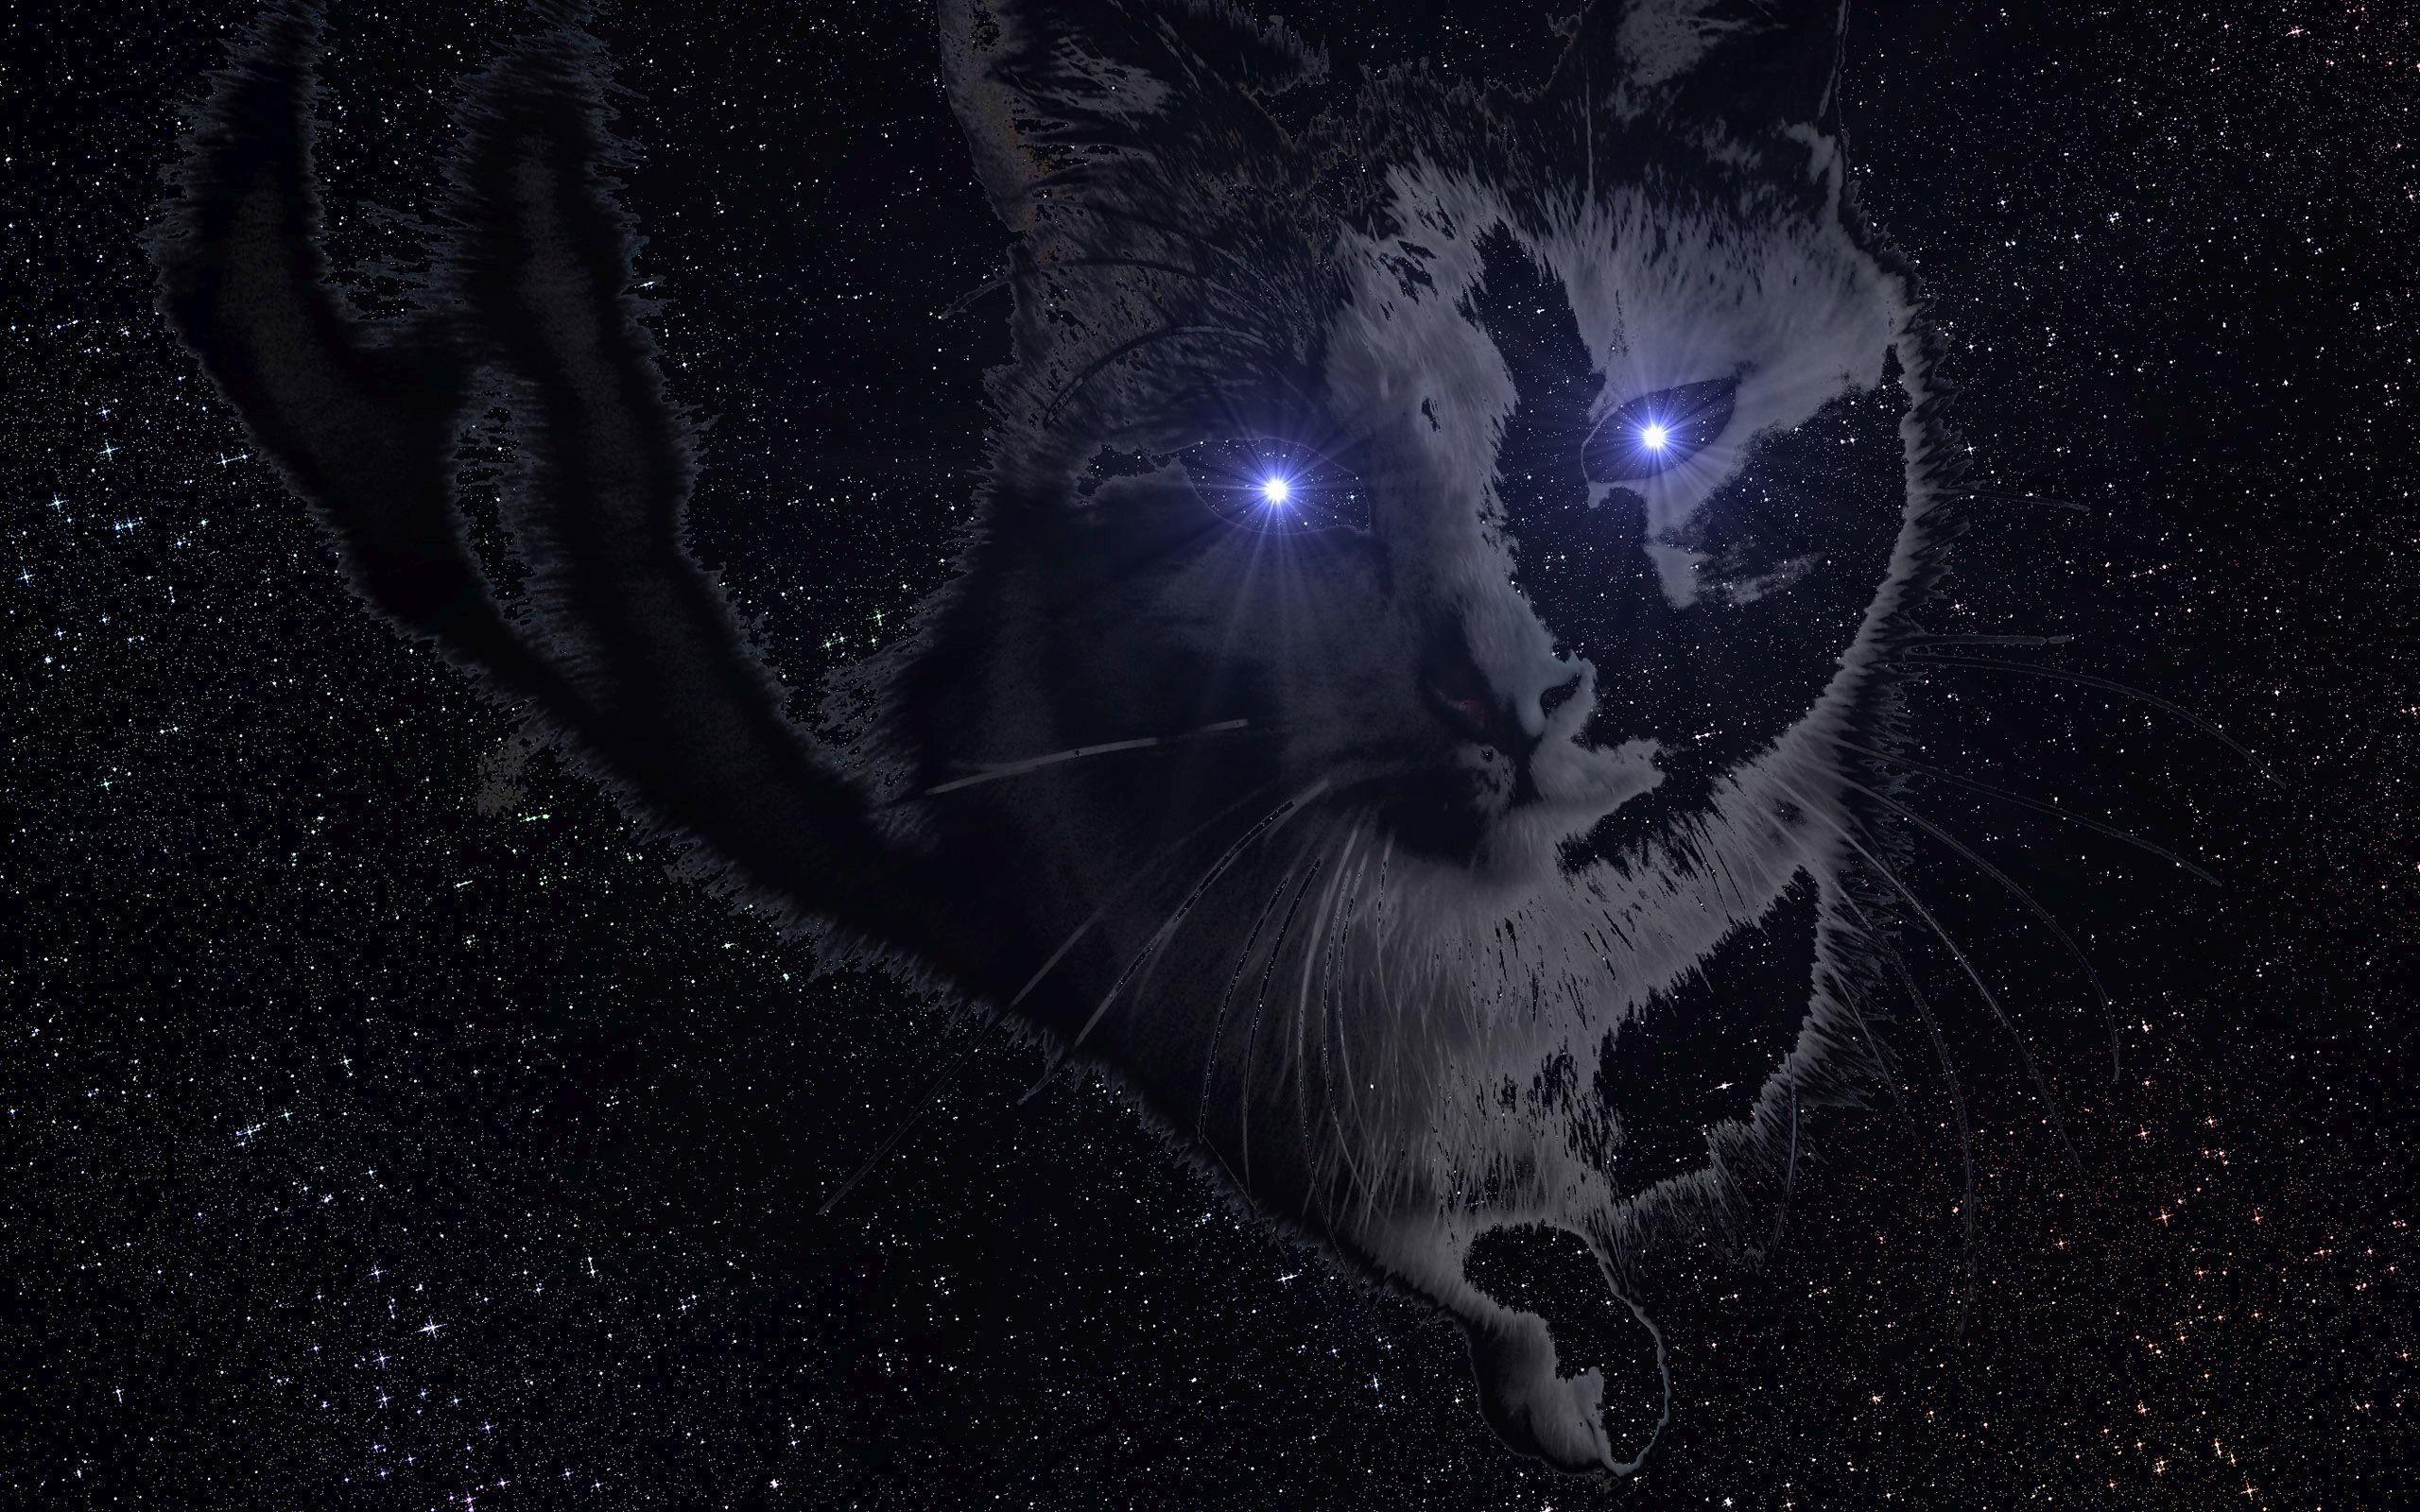 … Space cat HD Wallpaper 2560×1600